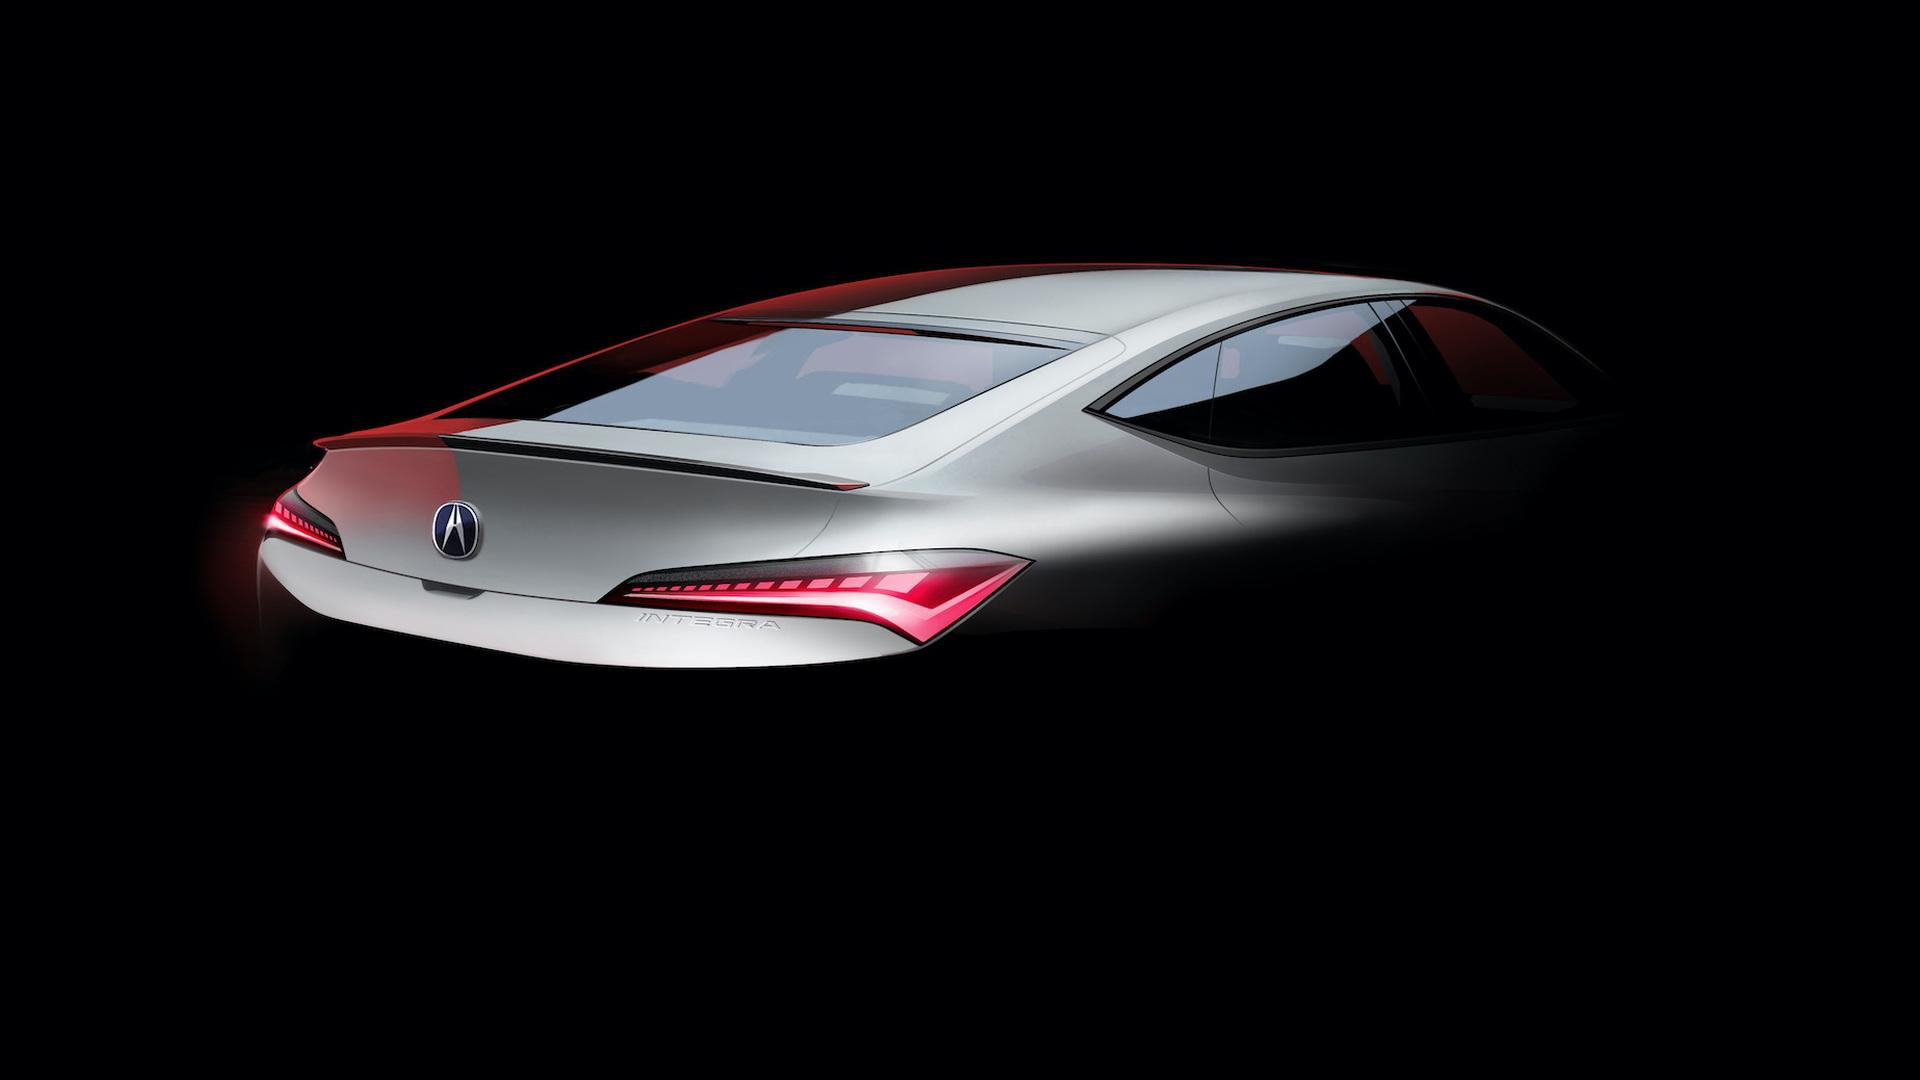 Teaser for Acura Integra